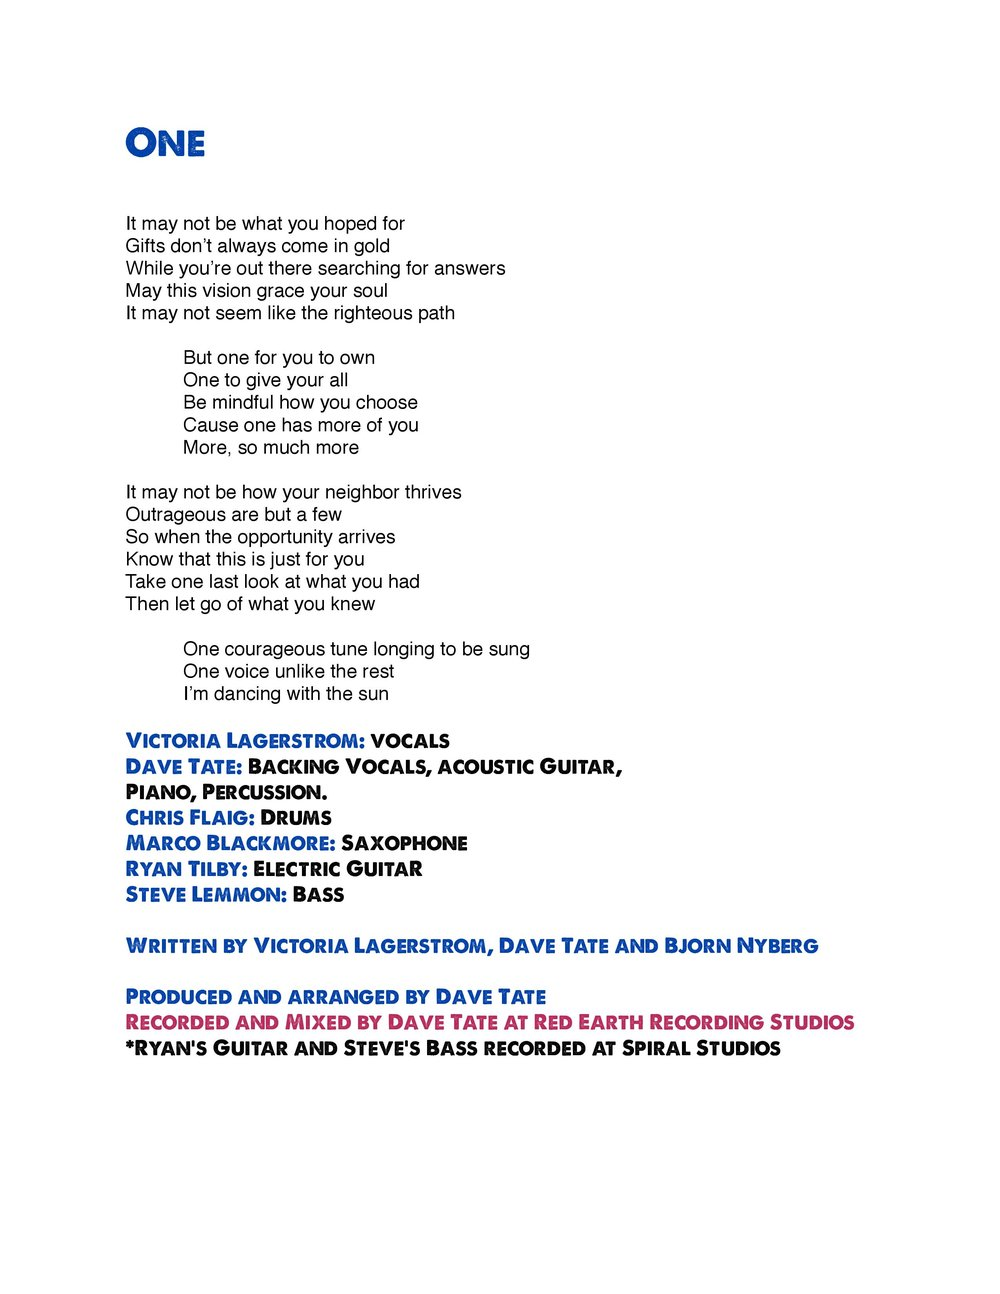 10 One Lyrics-page-001.jpg